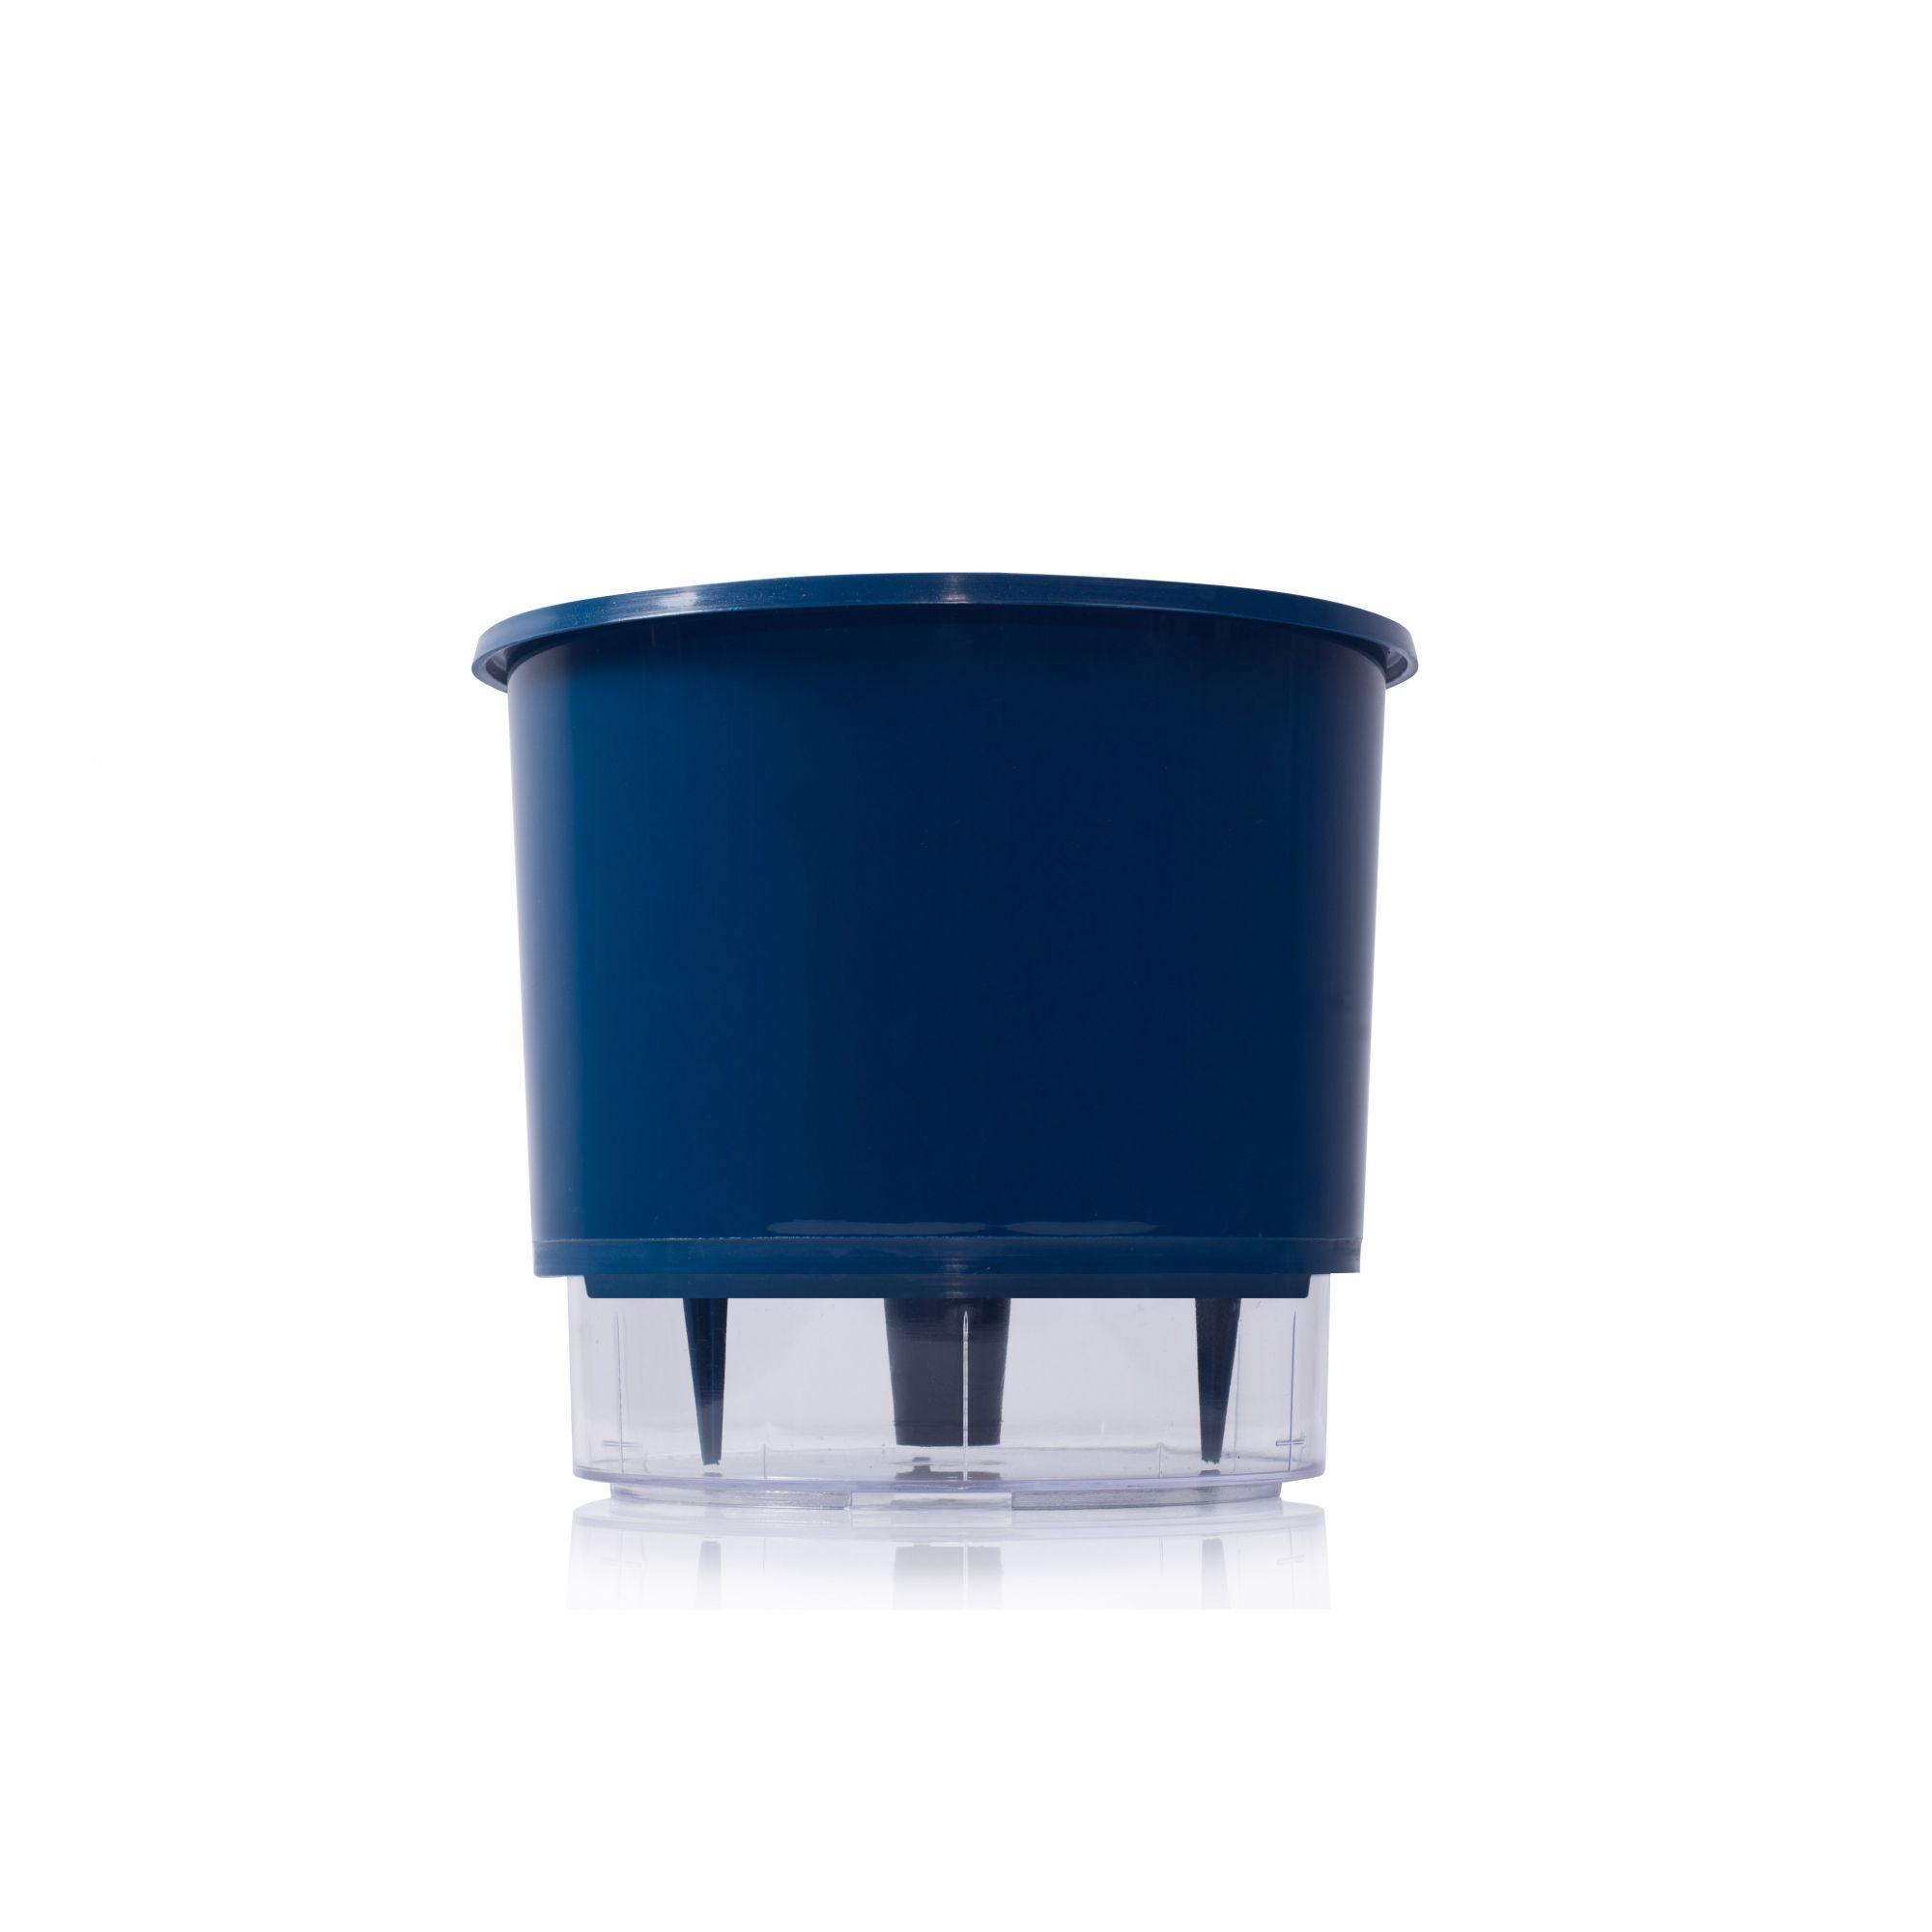 Vaso Autoirrigável 2 Azul Escuro Raiz